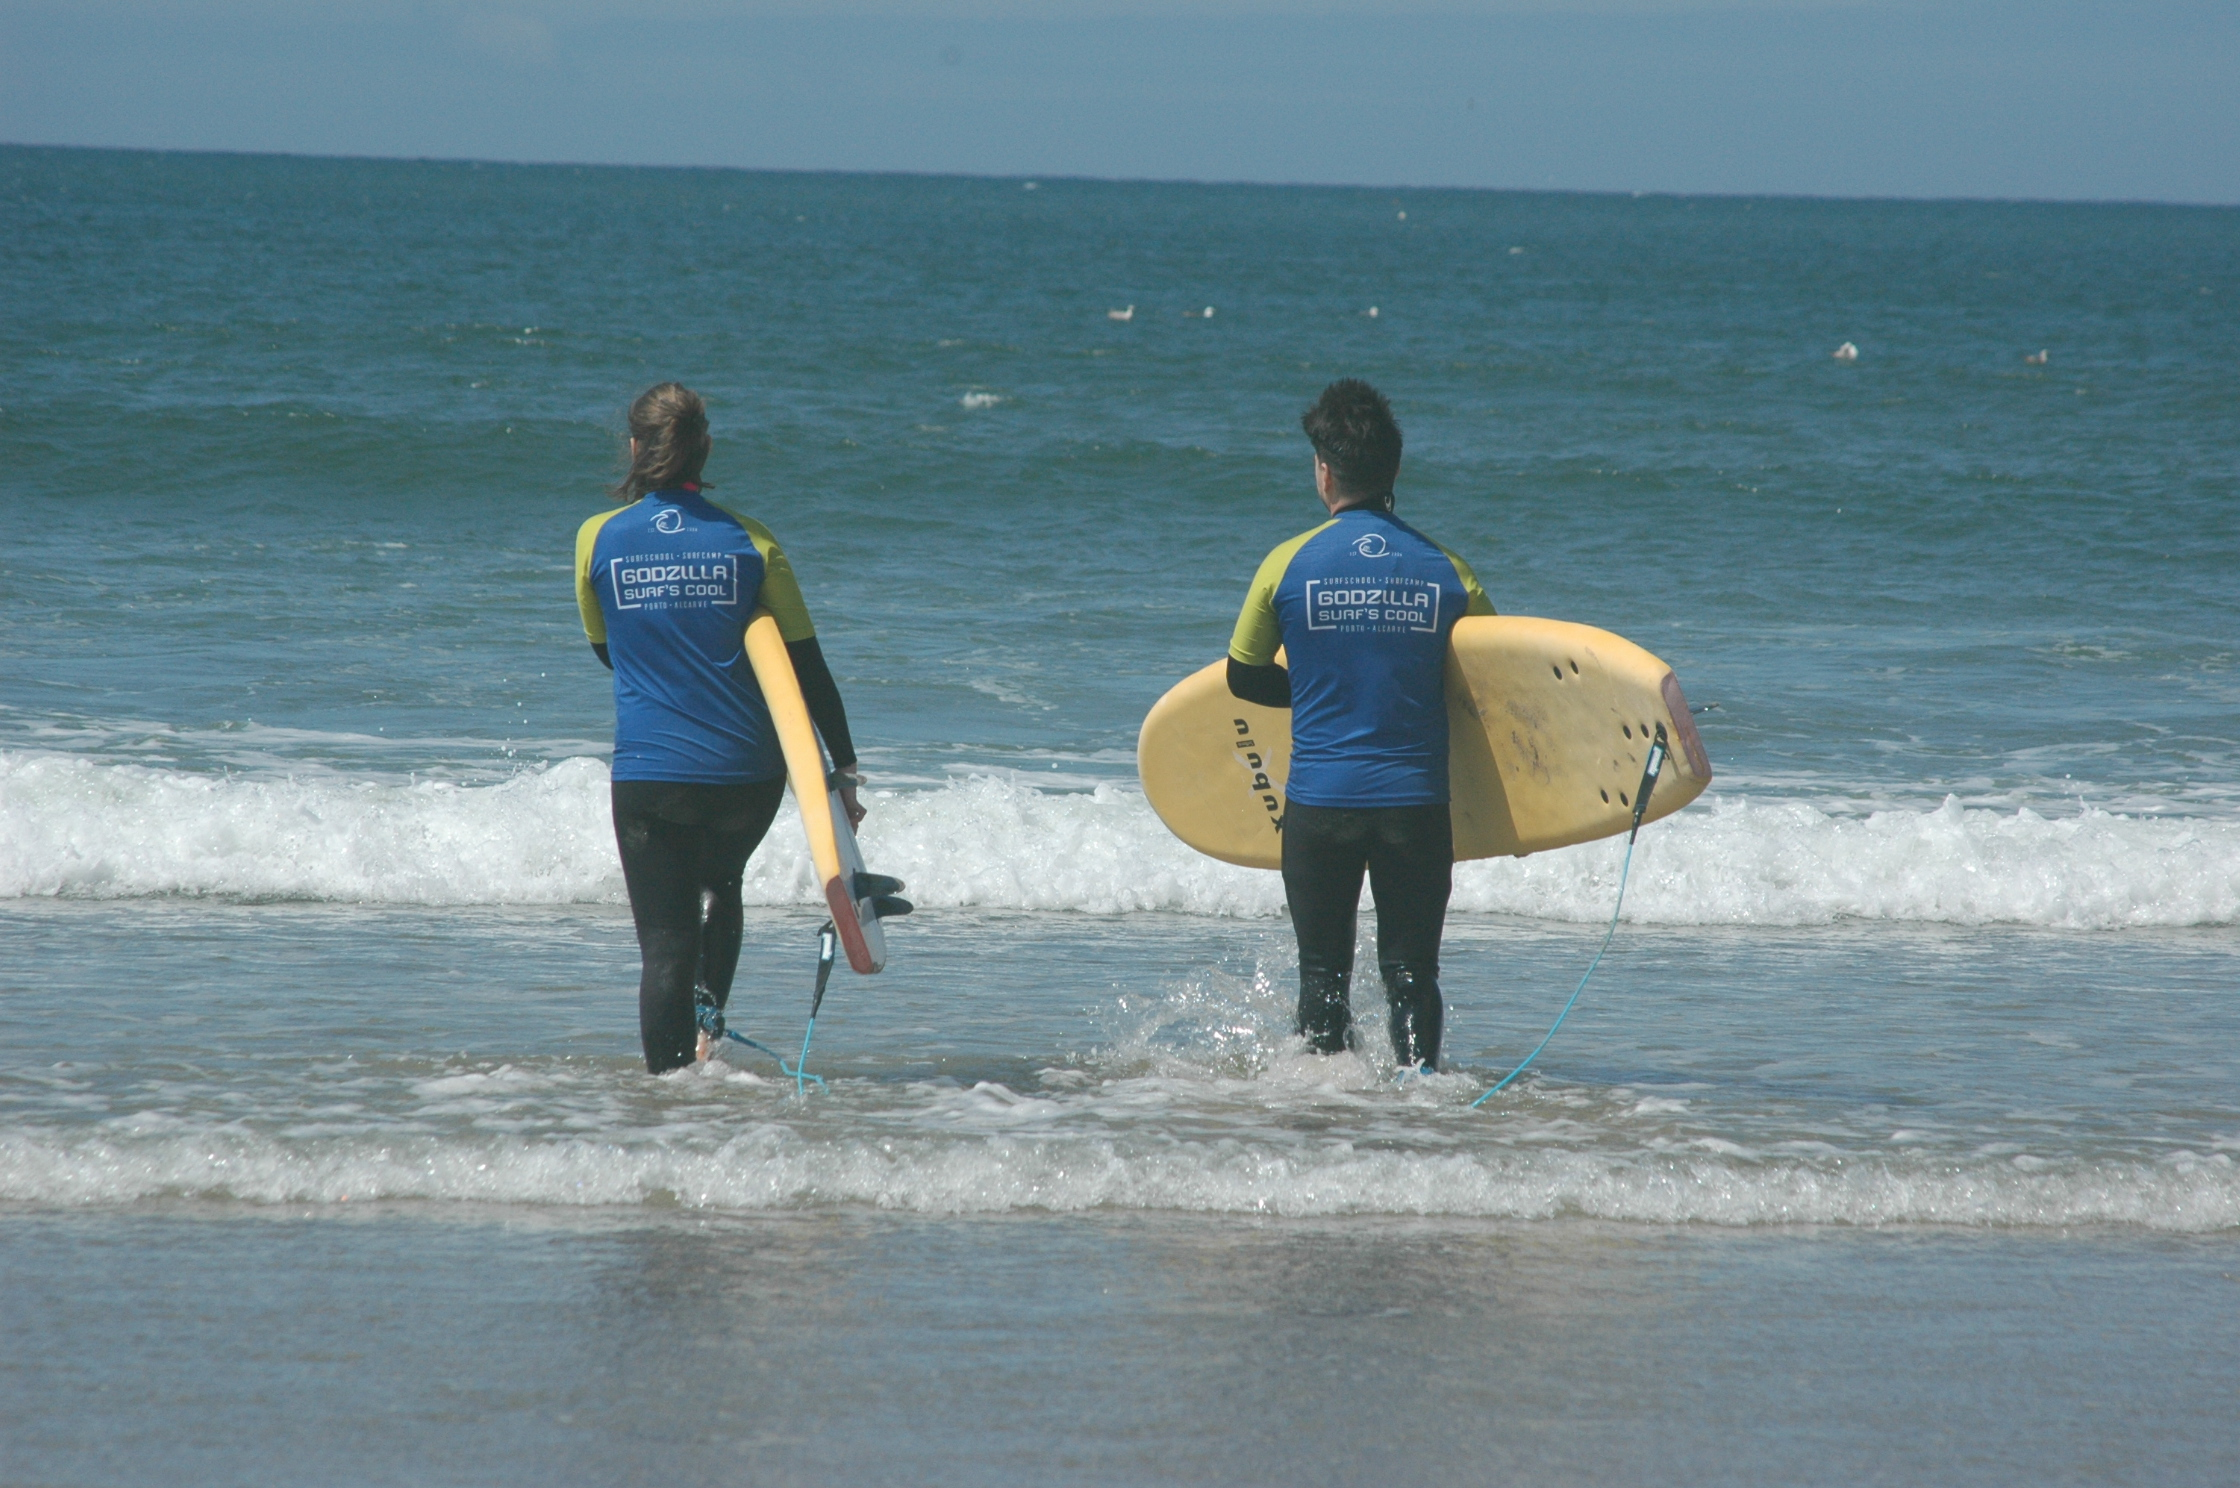 partner surfing